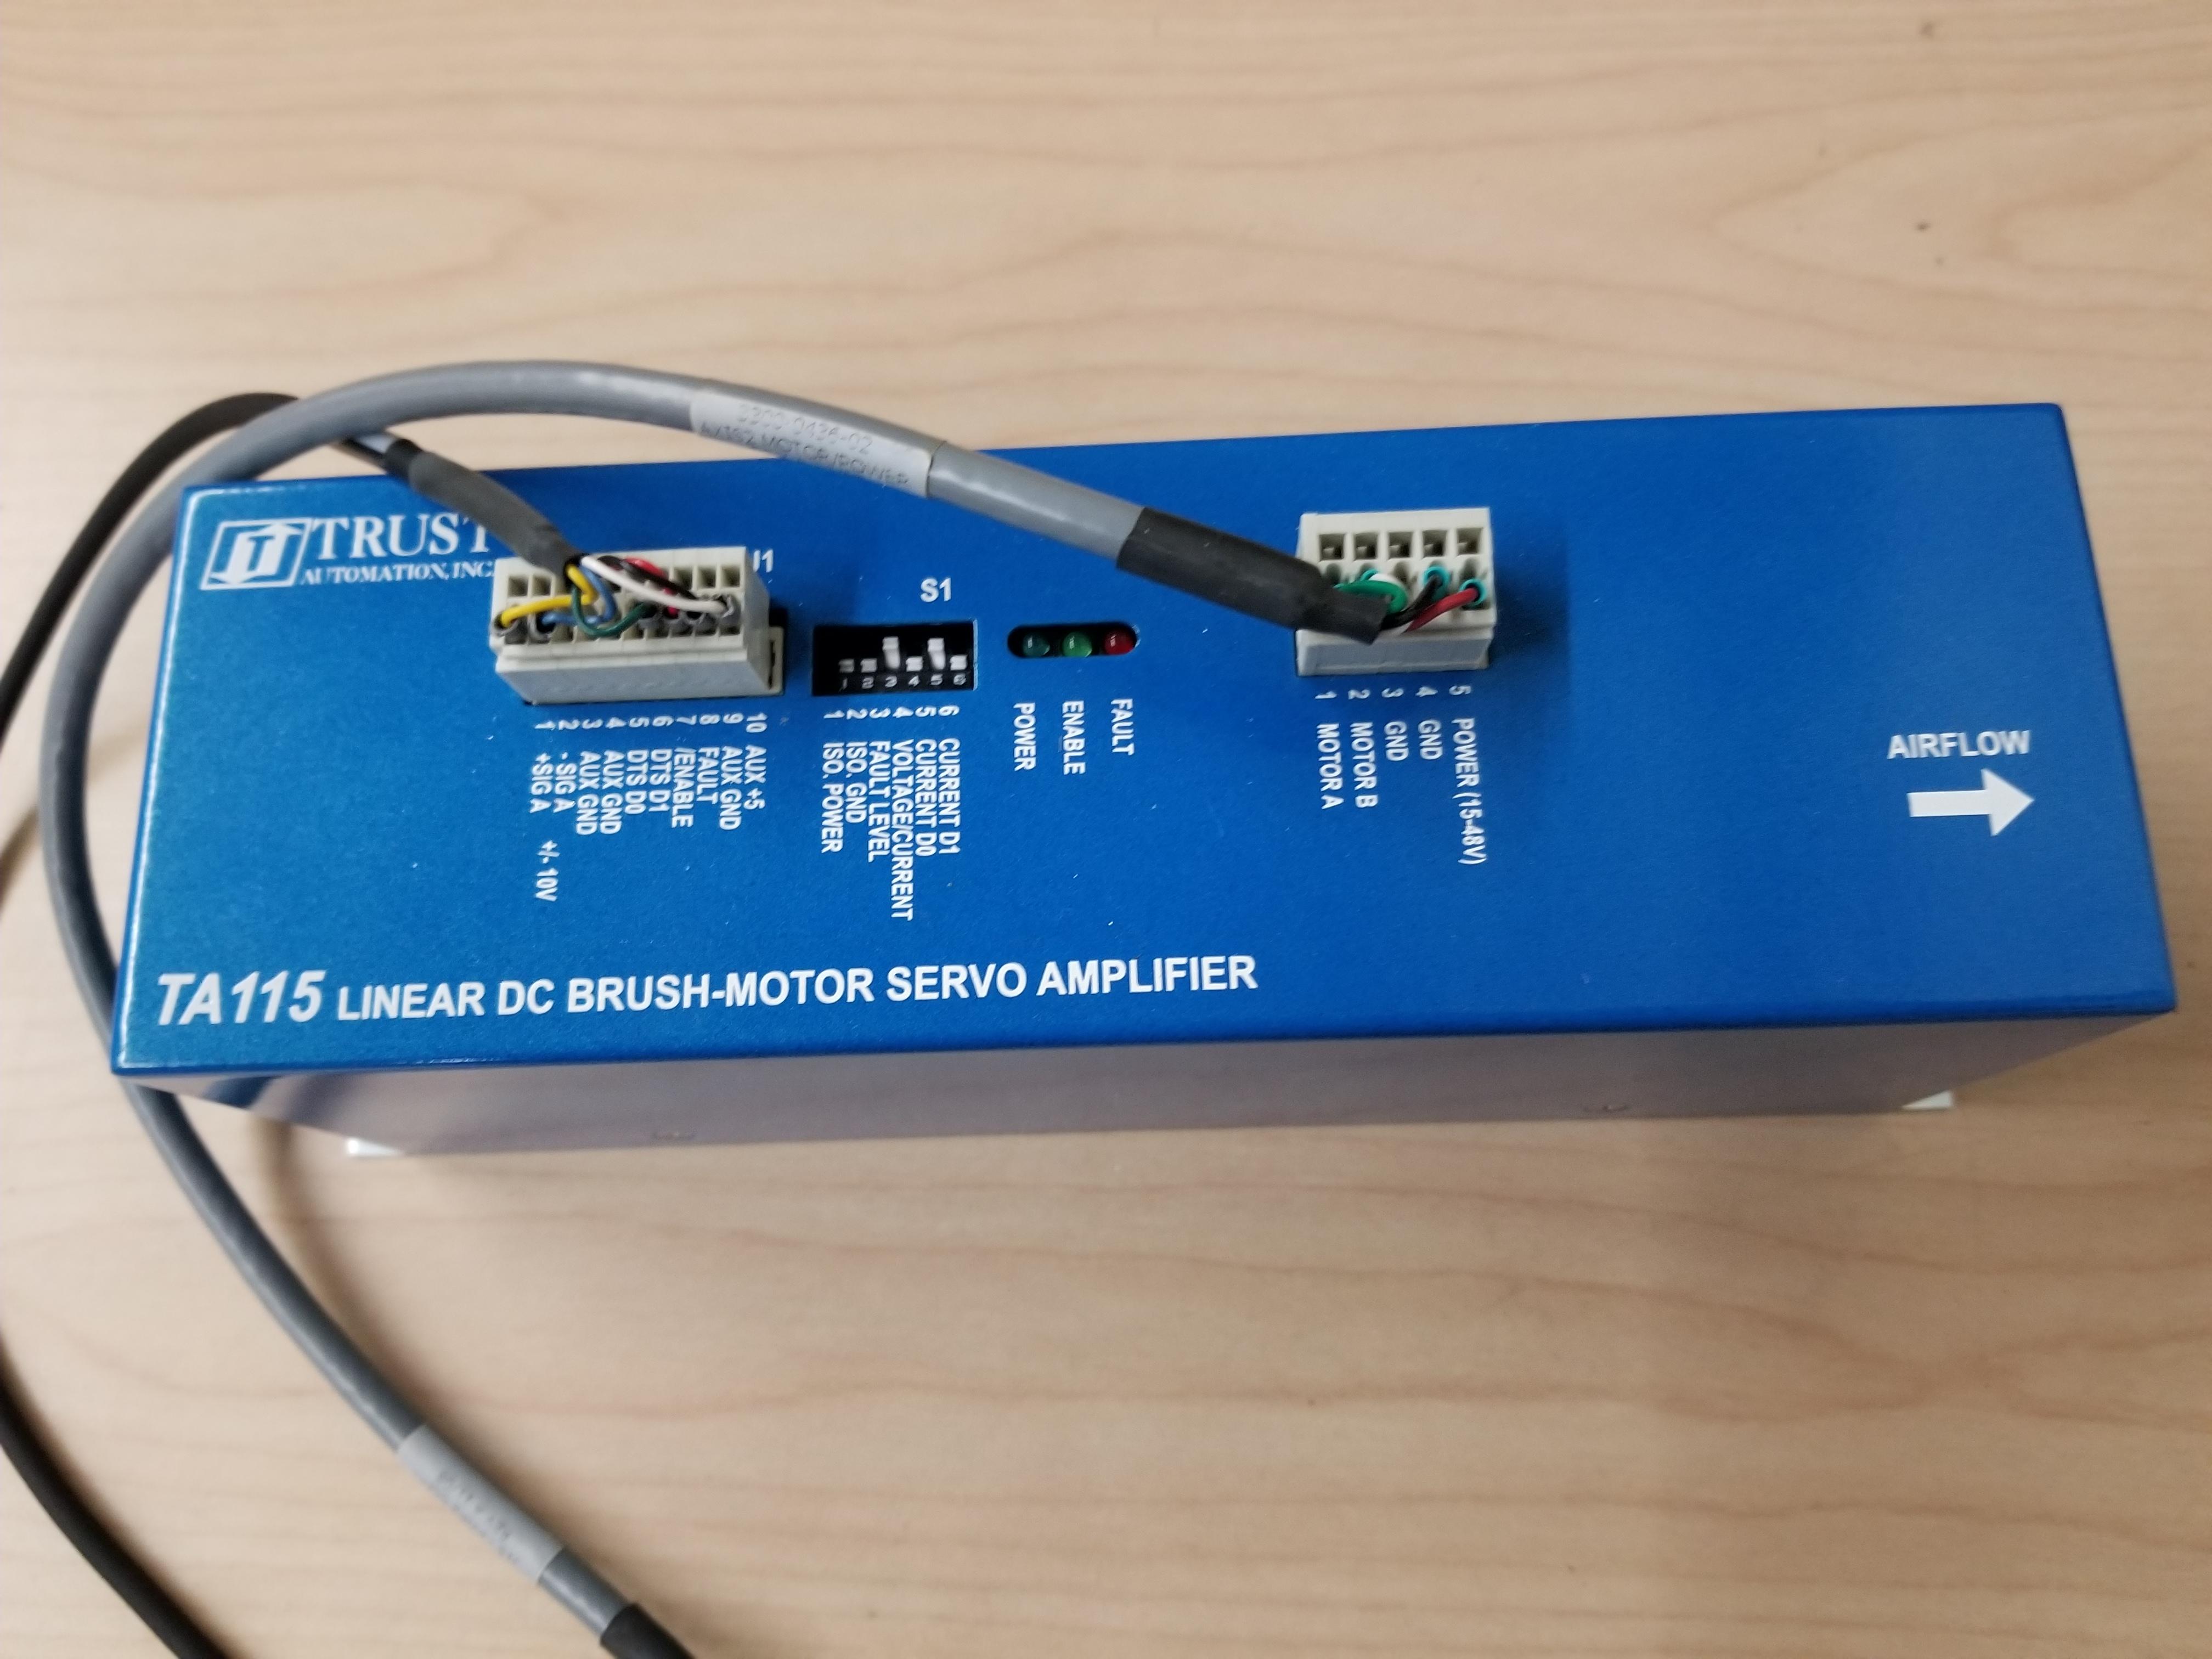 Trust Automation Linear DC Brush Motor Servo Amplifier - Image 2 of 2